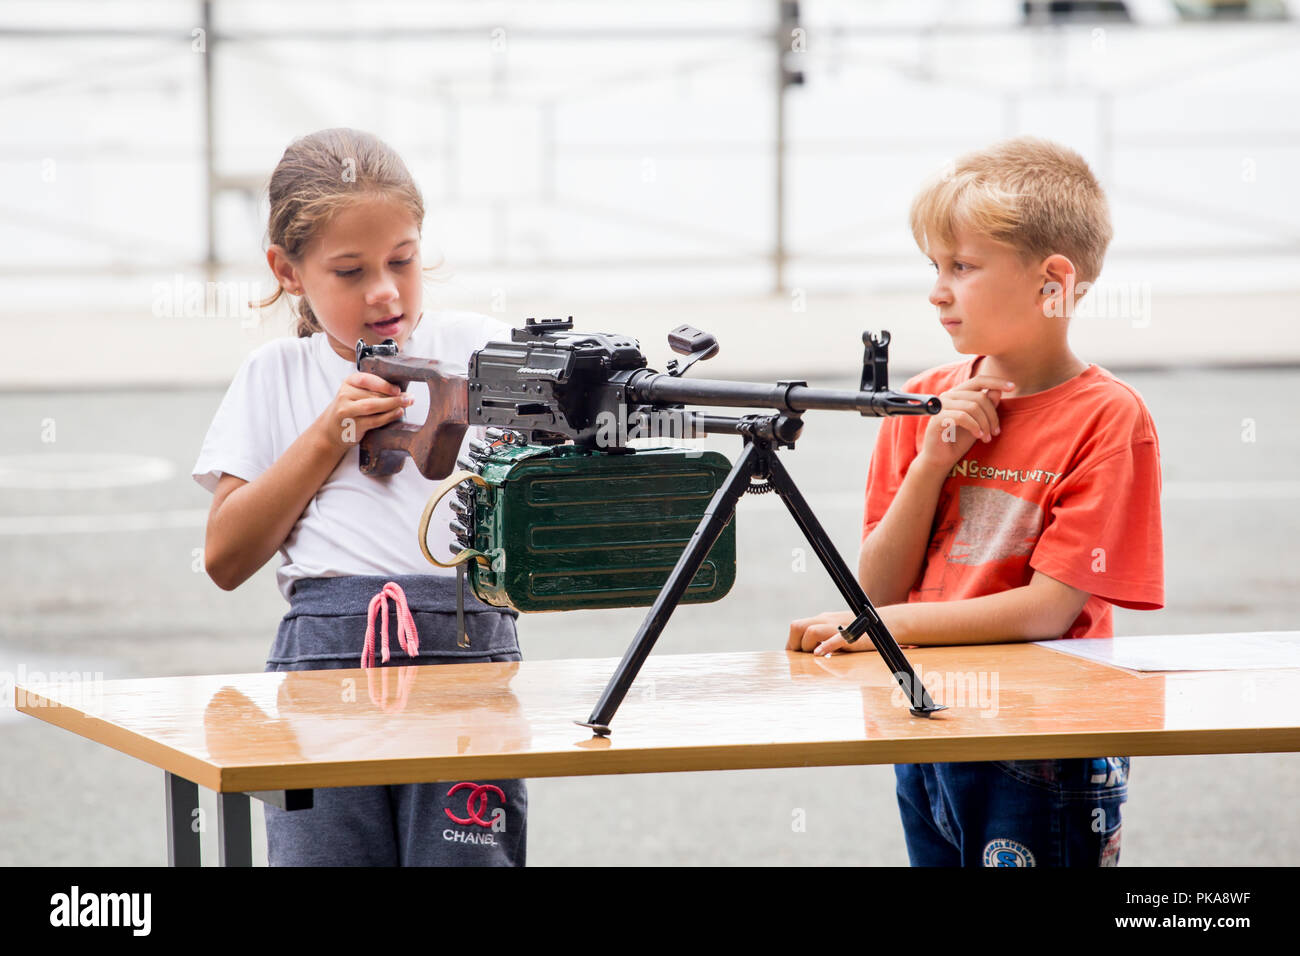 Russia, Vladivostok, 08/25/2018. Kids watch PK machine gun (known as 'Kalashnikov's Machinegun') on annual military exhibition 'Russian Army 2018'. - Stock Image